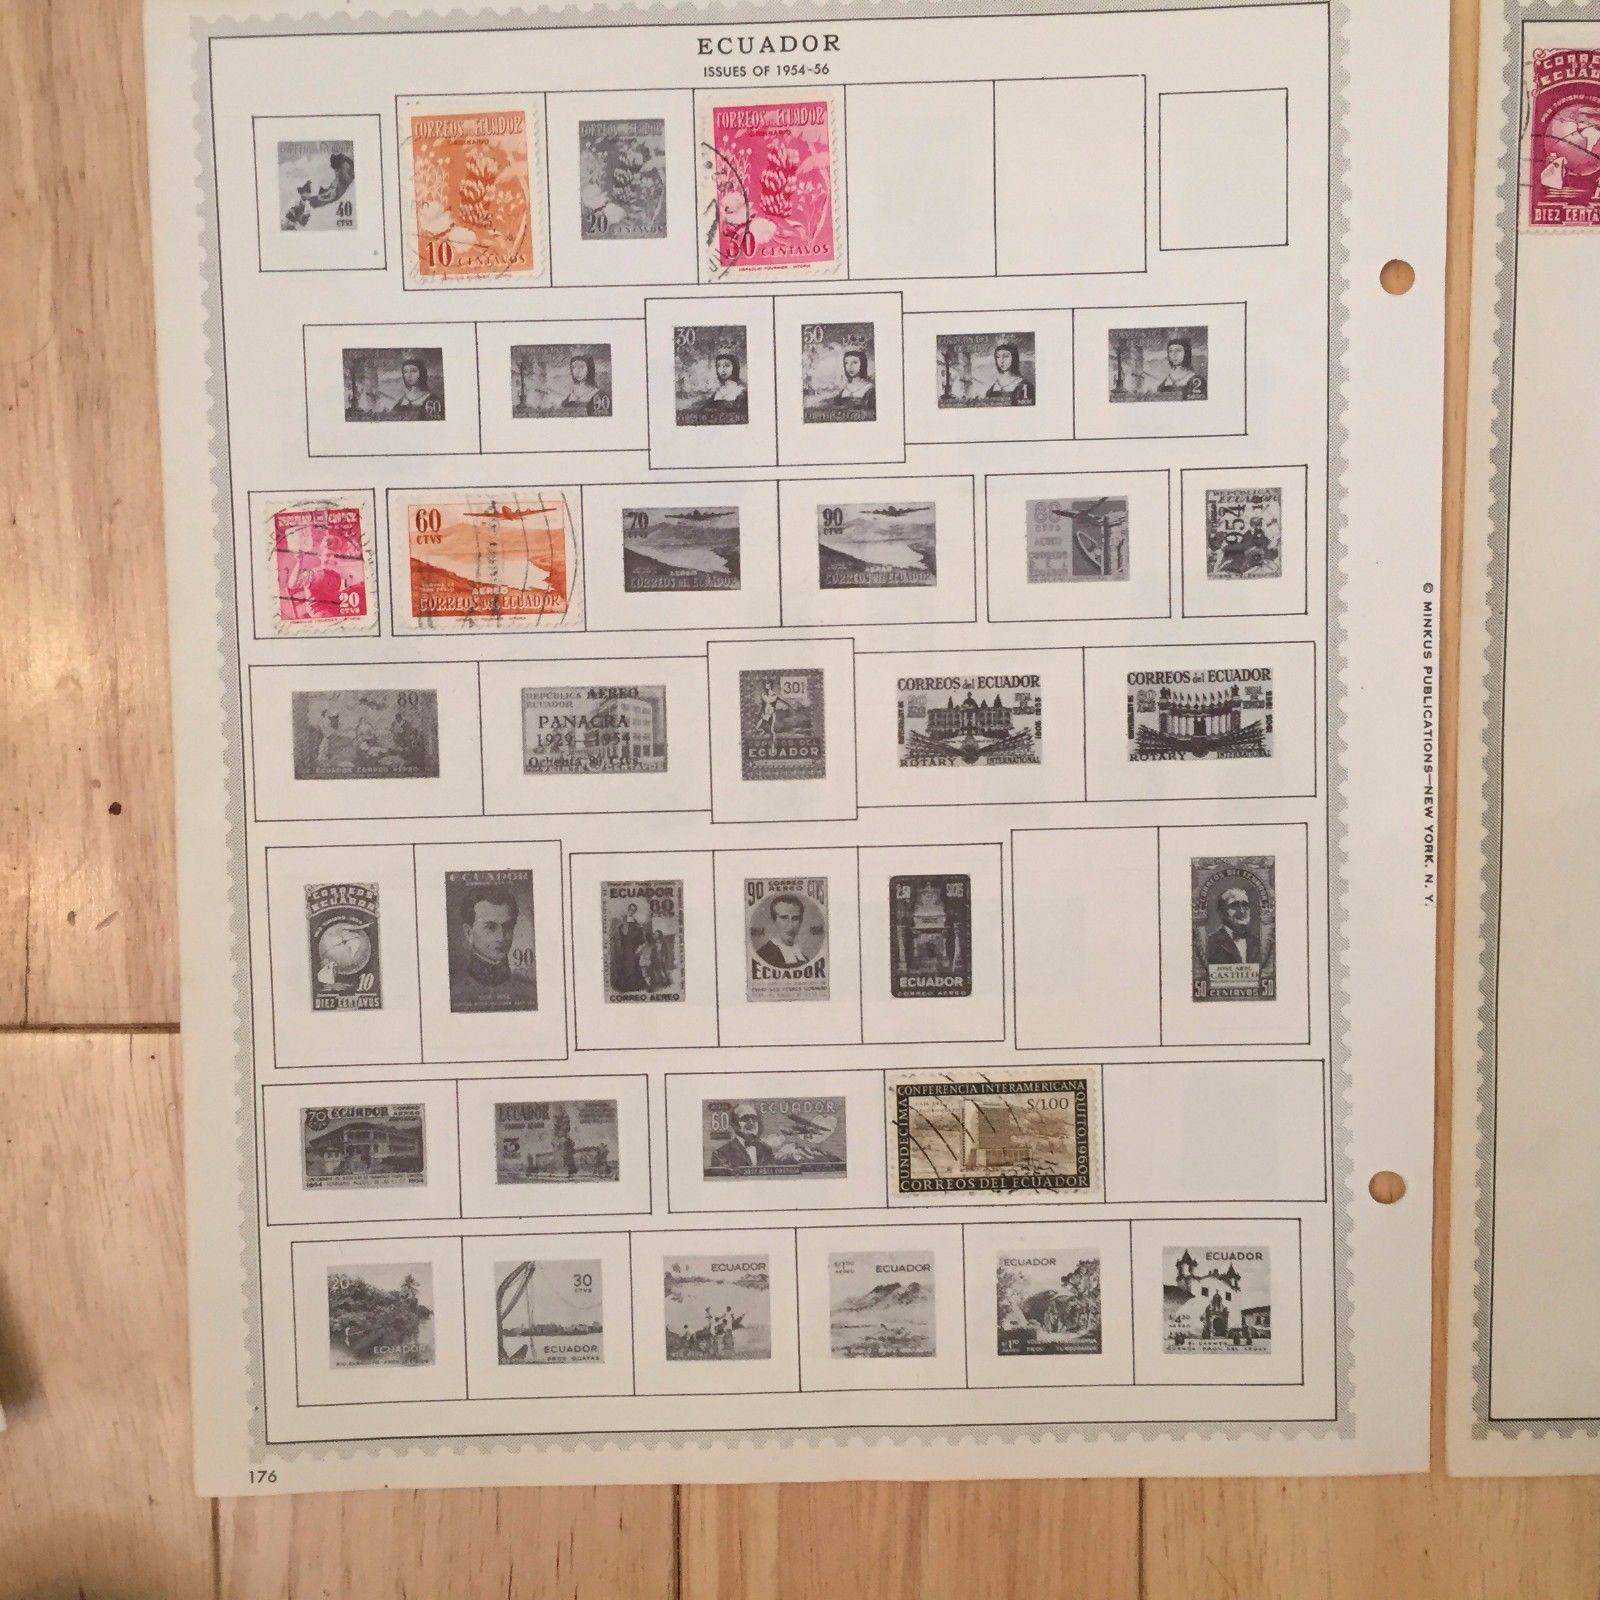 K71 Ecuador 1881-1958 Stamps Minkus Hinged Pages Bicentennial Aereo Servicio